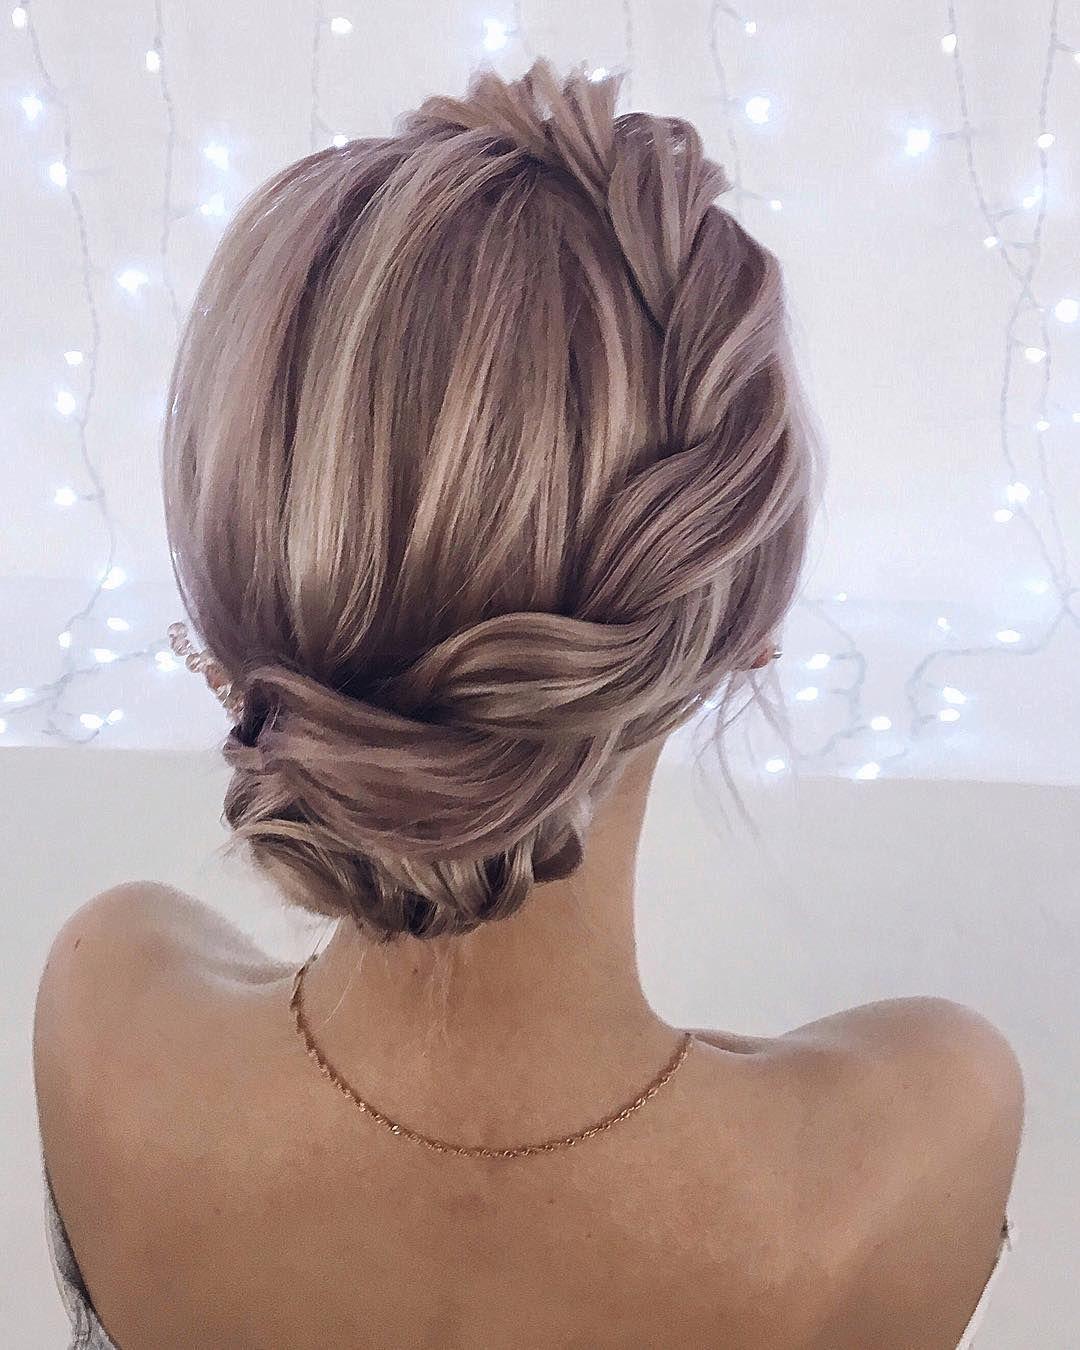 Updo Bridal Hairstyles Unique Wedding Hair Ideas To Inspire You Weddinghair Hairideas Hairdo Weddings Weddinghairstyles Bridalhair